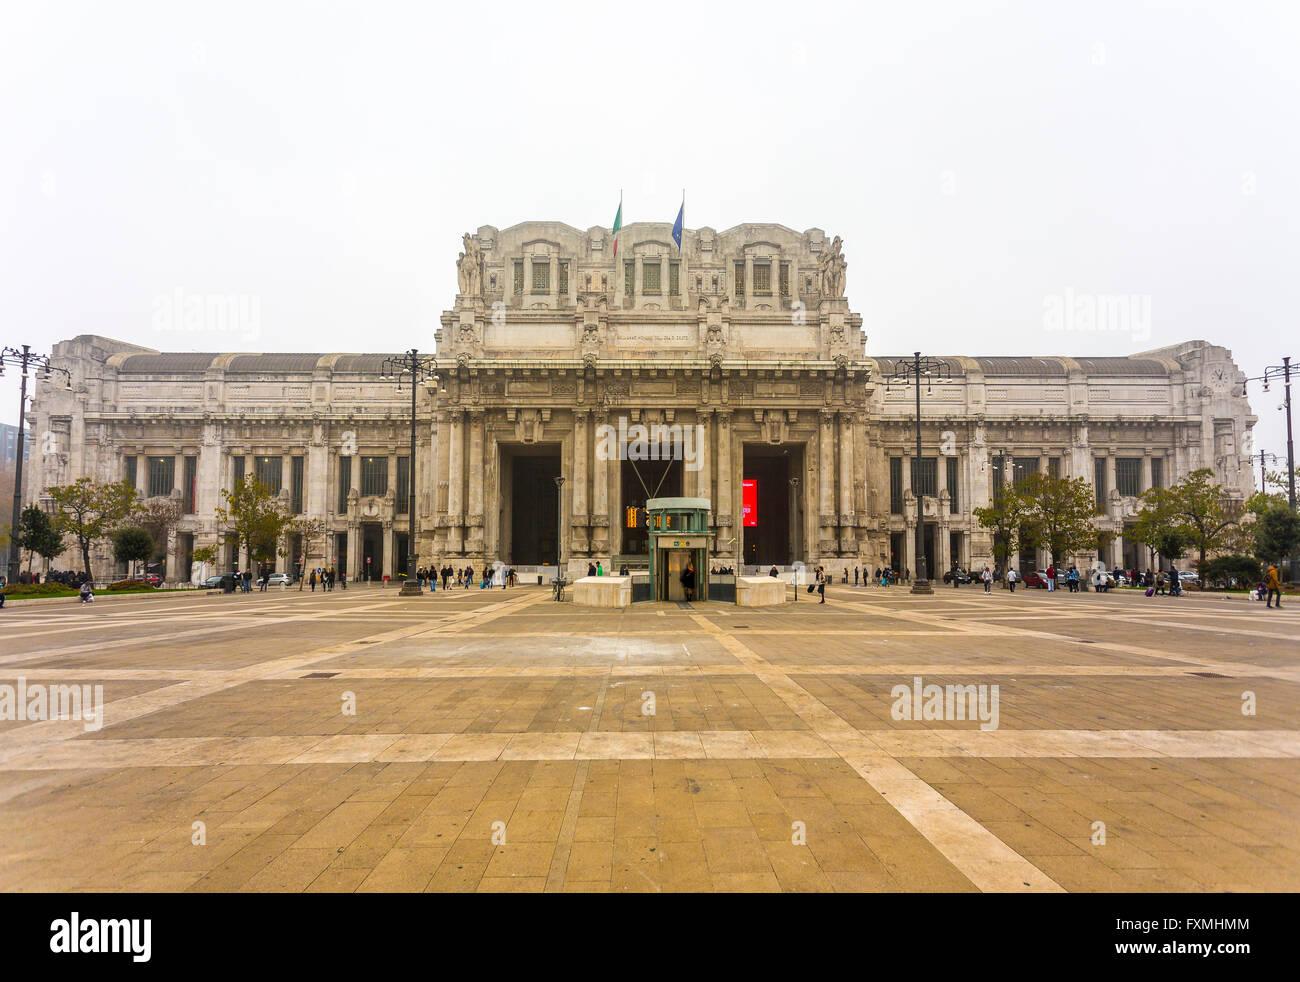 Milano Centrale Railway Station, Milan, Italy - Stock Image